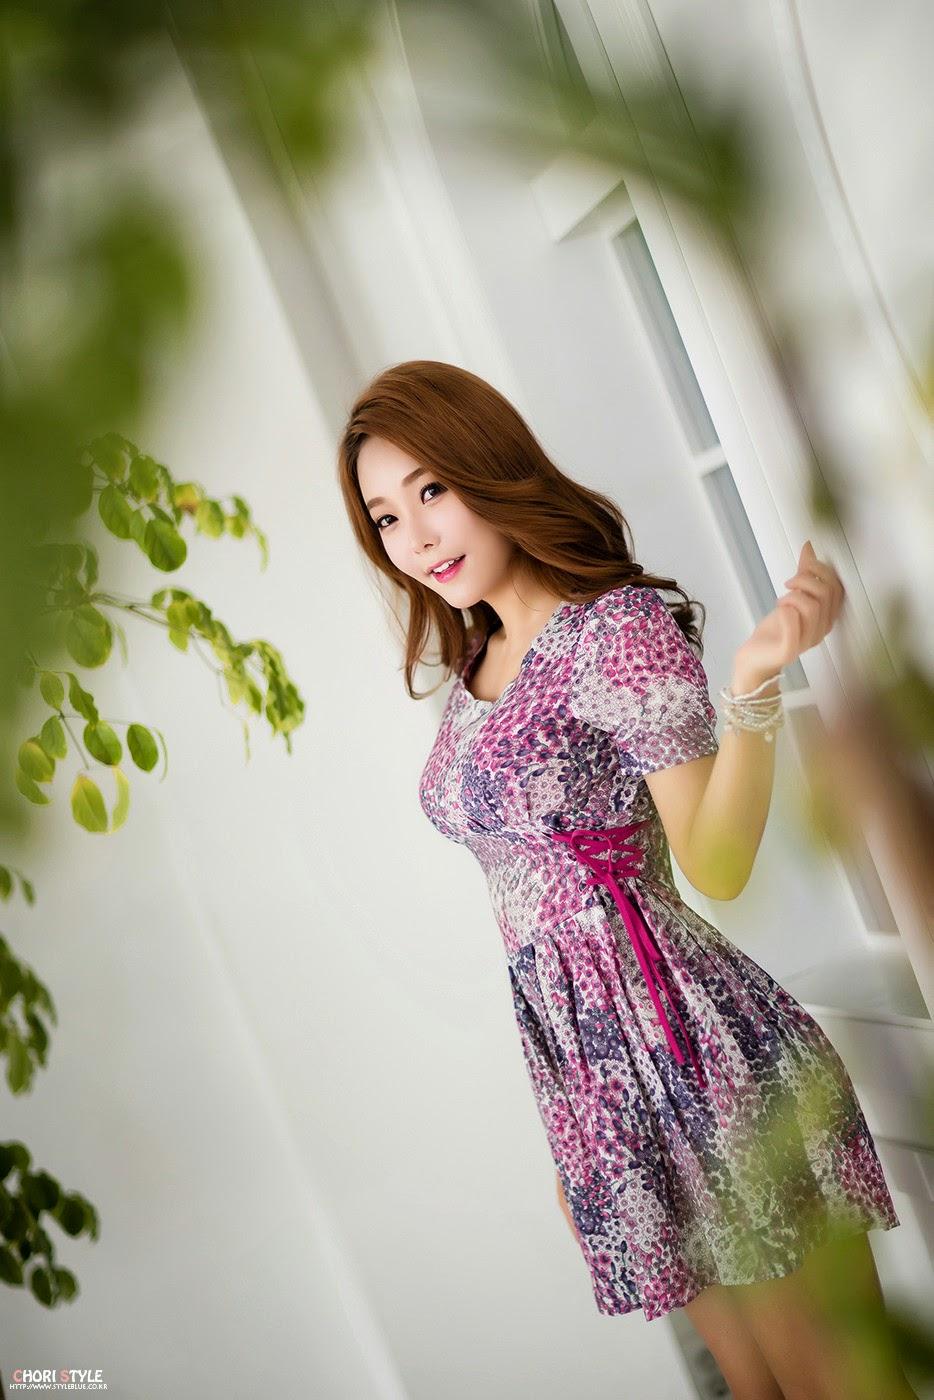 3 Lee Da Hee - very cute asian girl-girlcute4u.blogspot.com